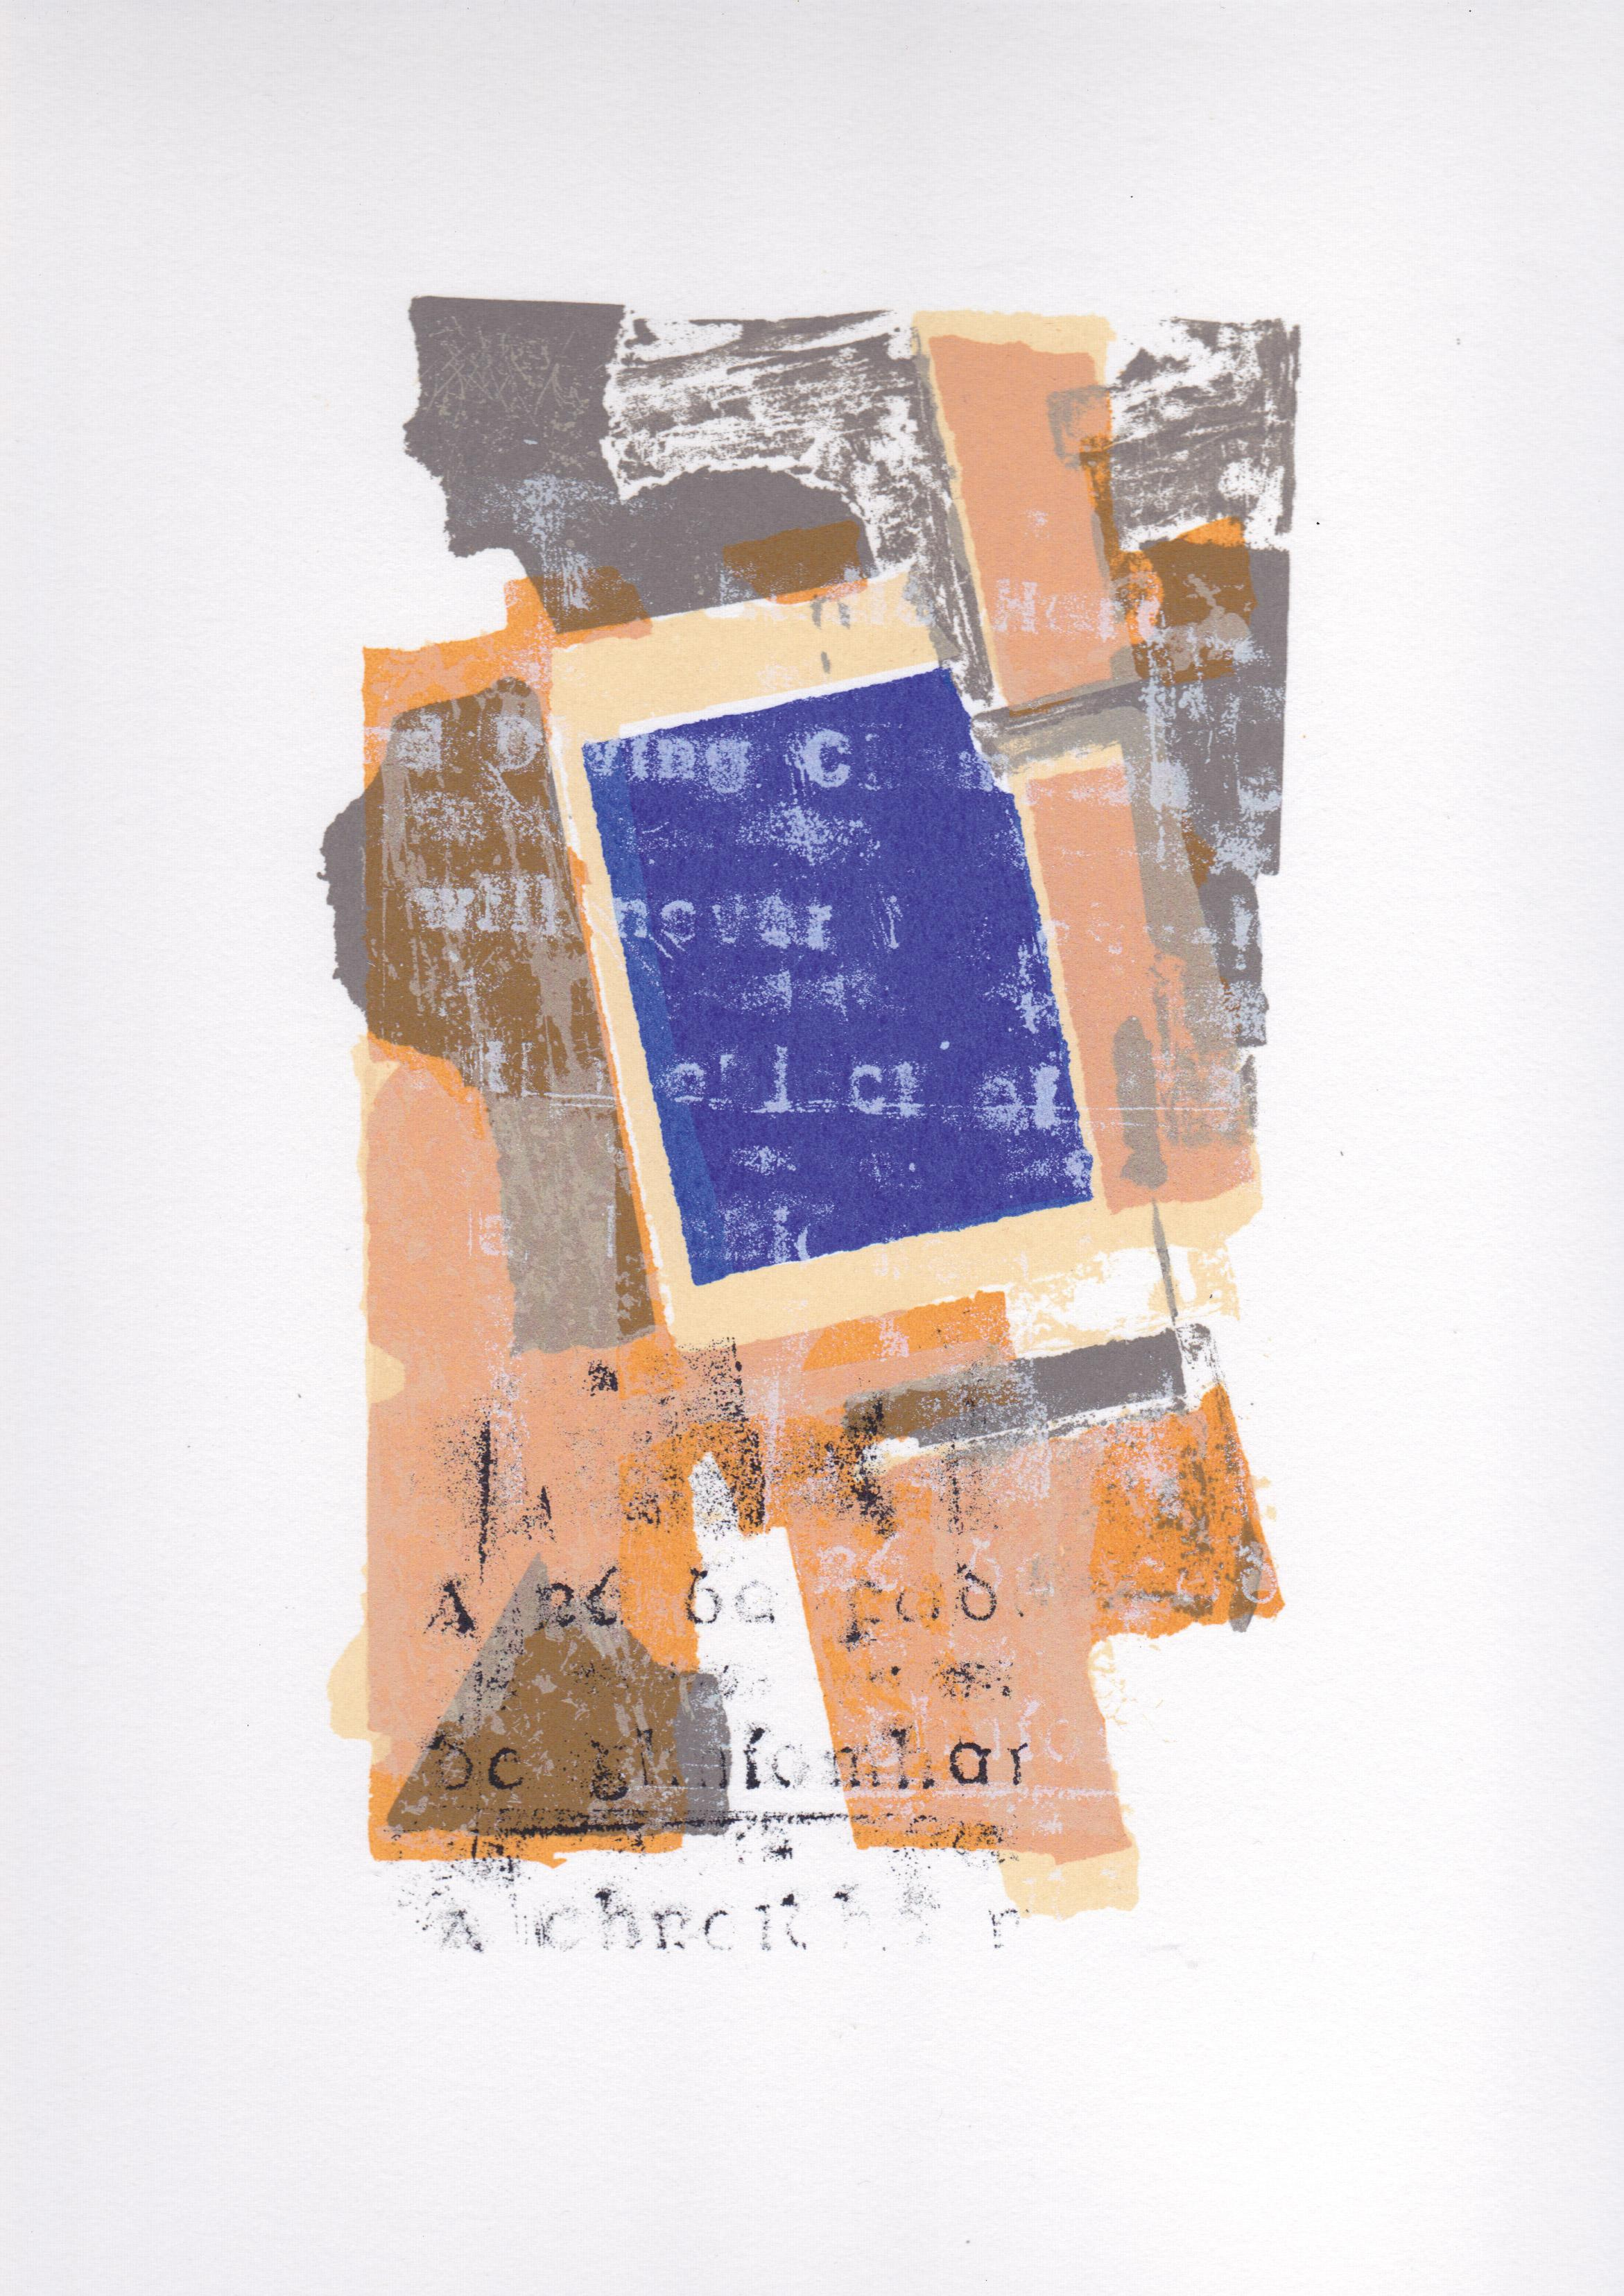 Abstract printed image